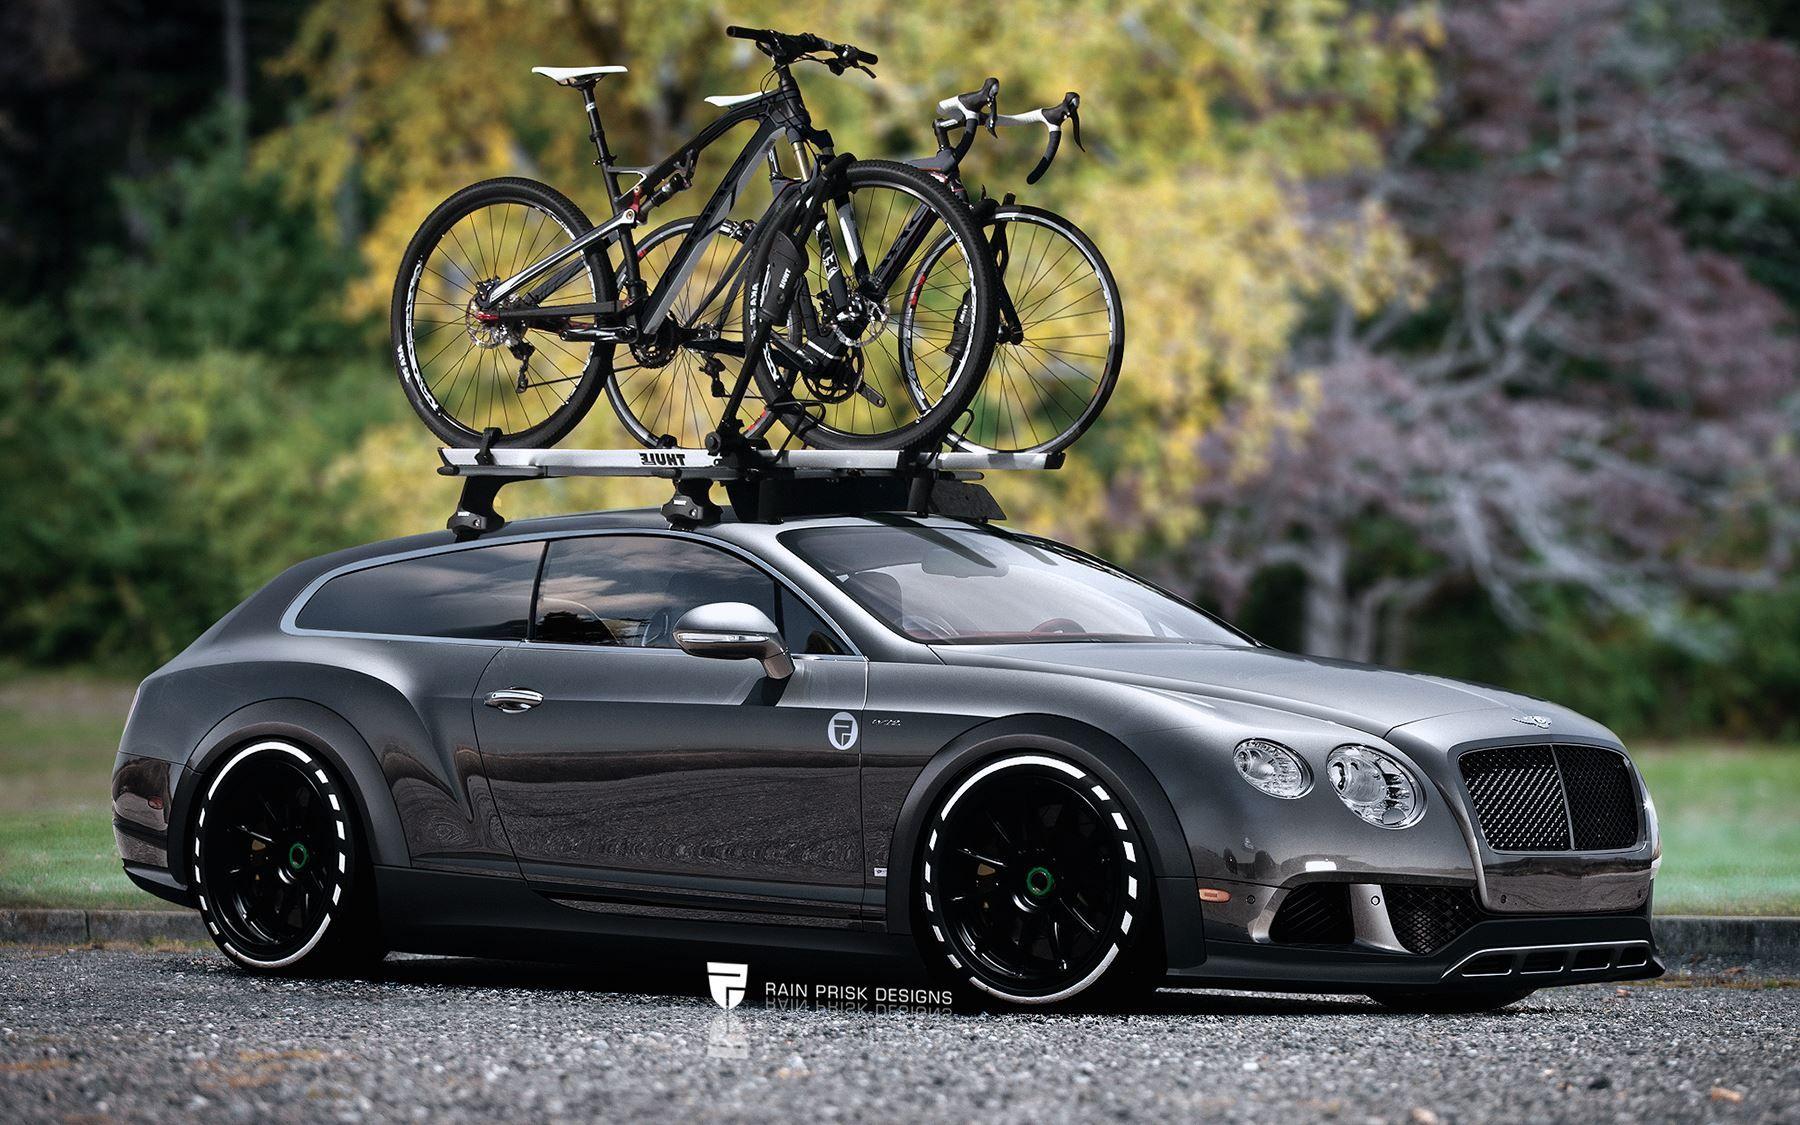 Bentley Continental Gt Wagon Wildly Imagined Carhoots Bentley Continental Bentley Continental Gt Bentley Car